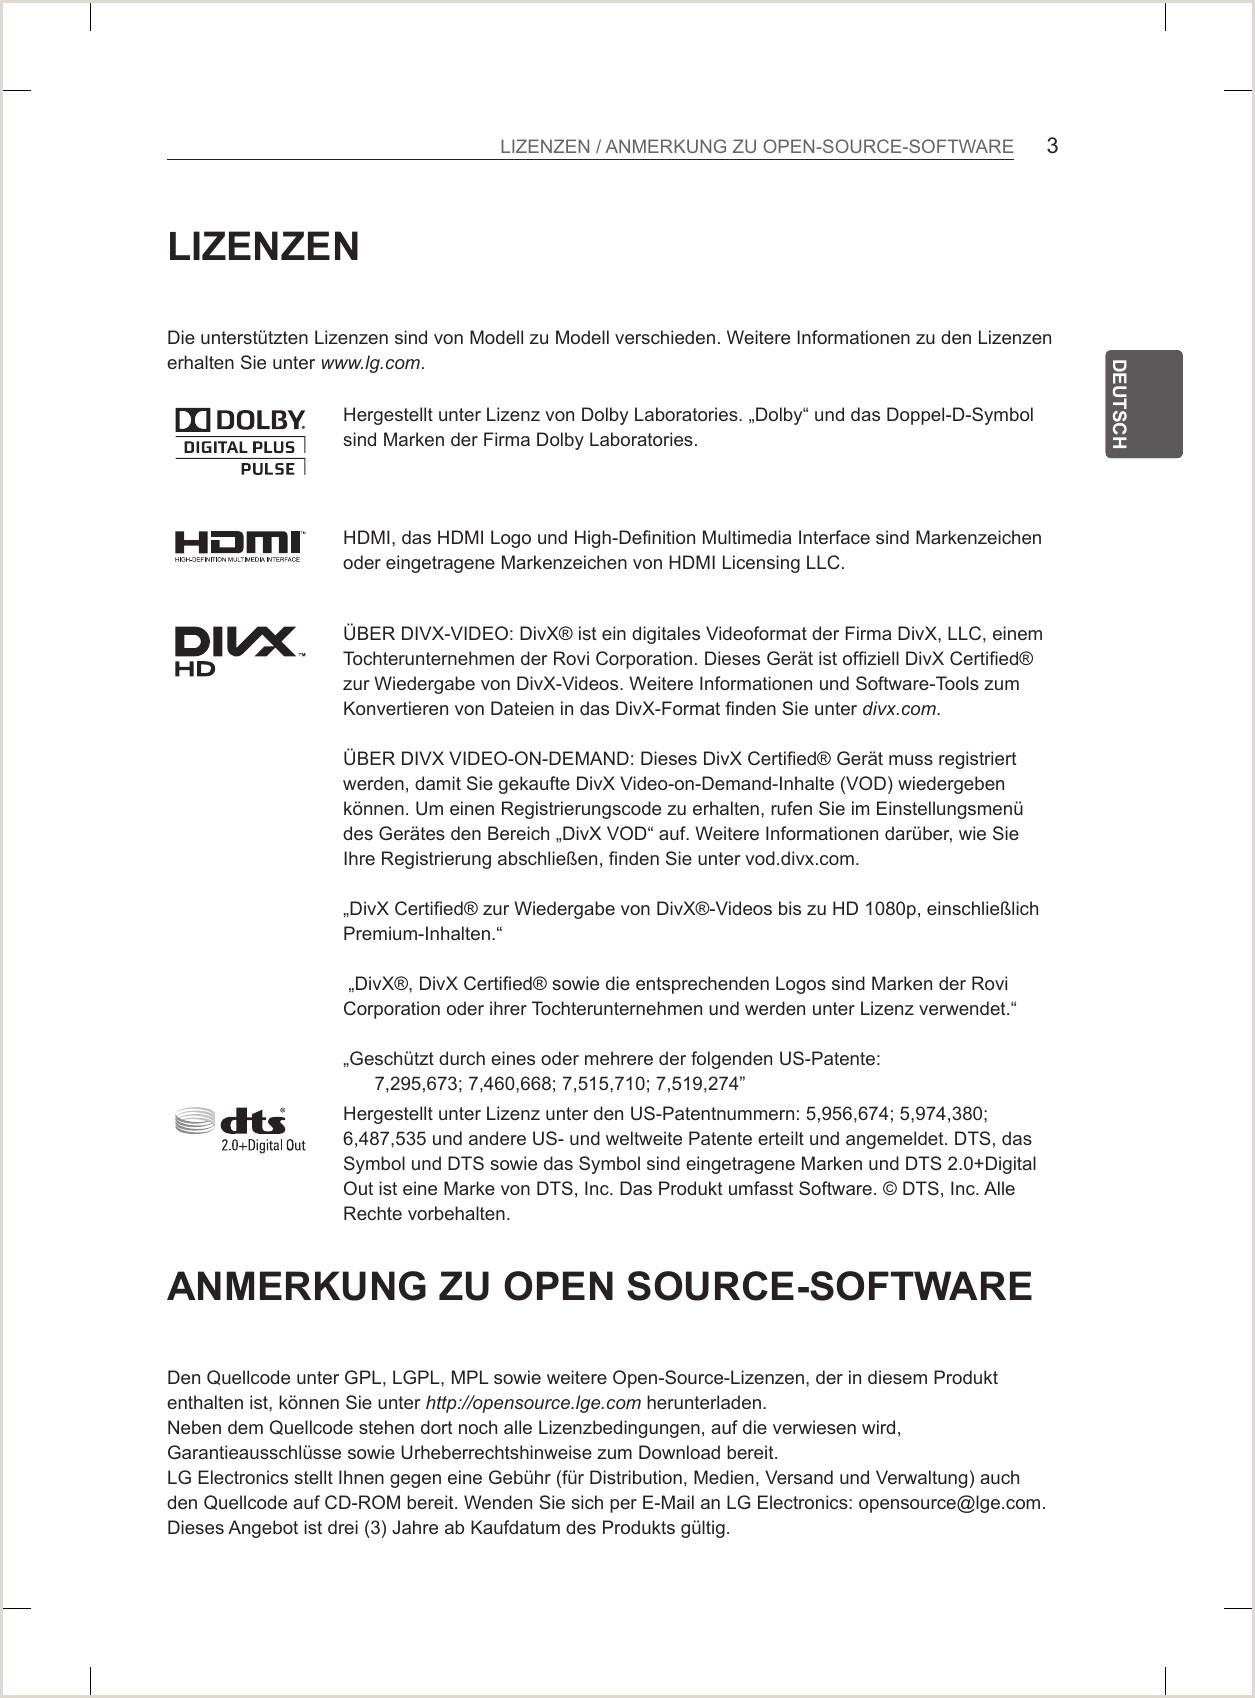 Hoja De Vida formato Unico En Pdf Lg 47lm670s Users Manual Microsoft Mfl [˜¸™˜ 모드]